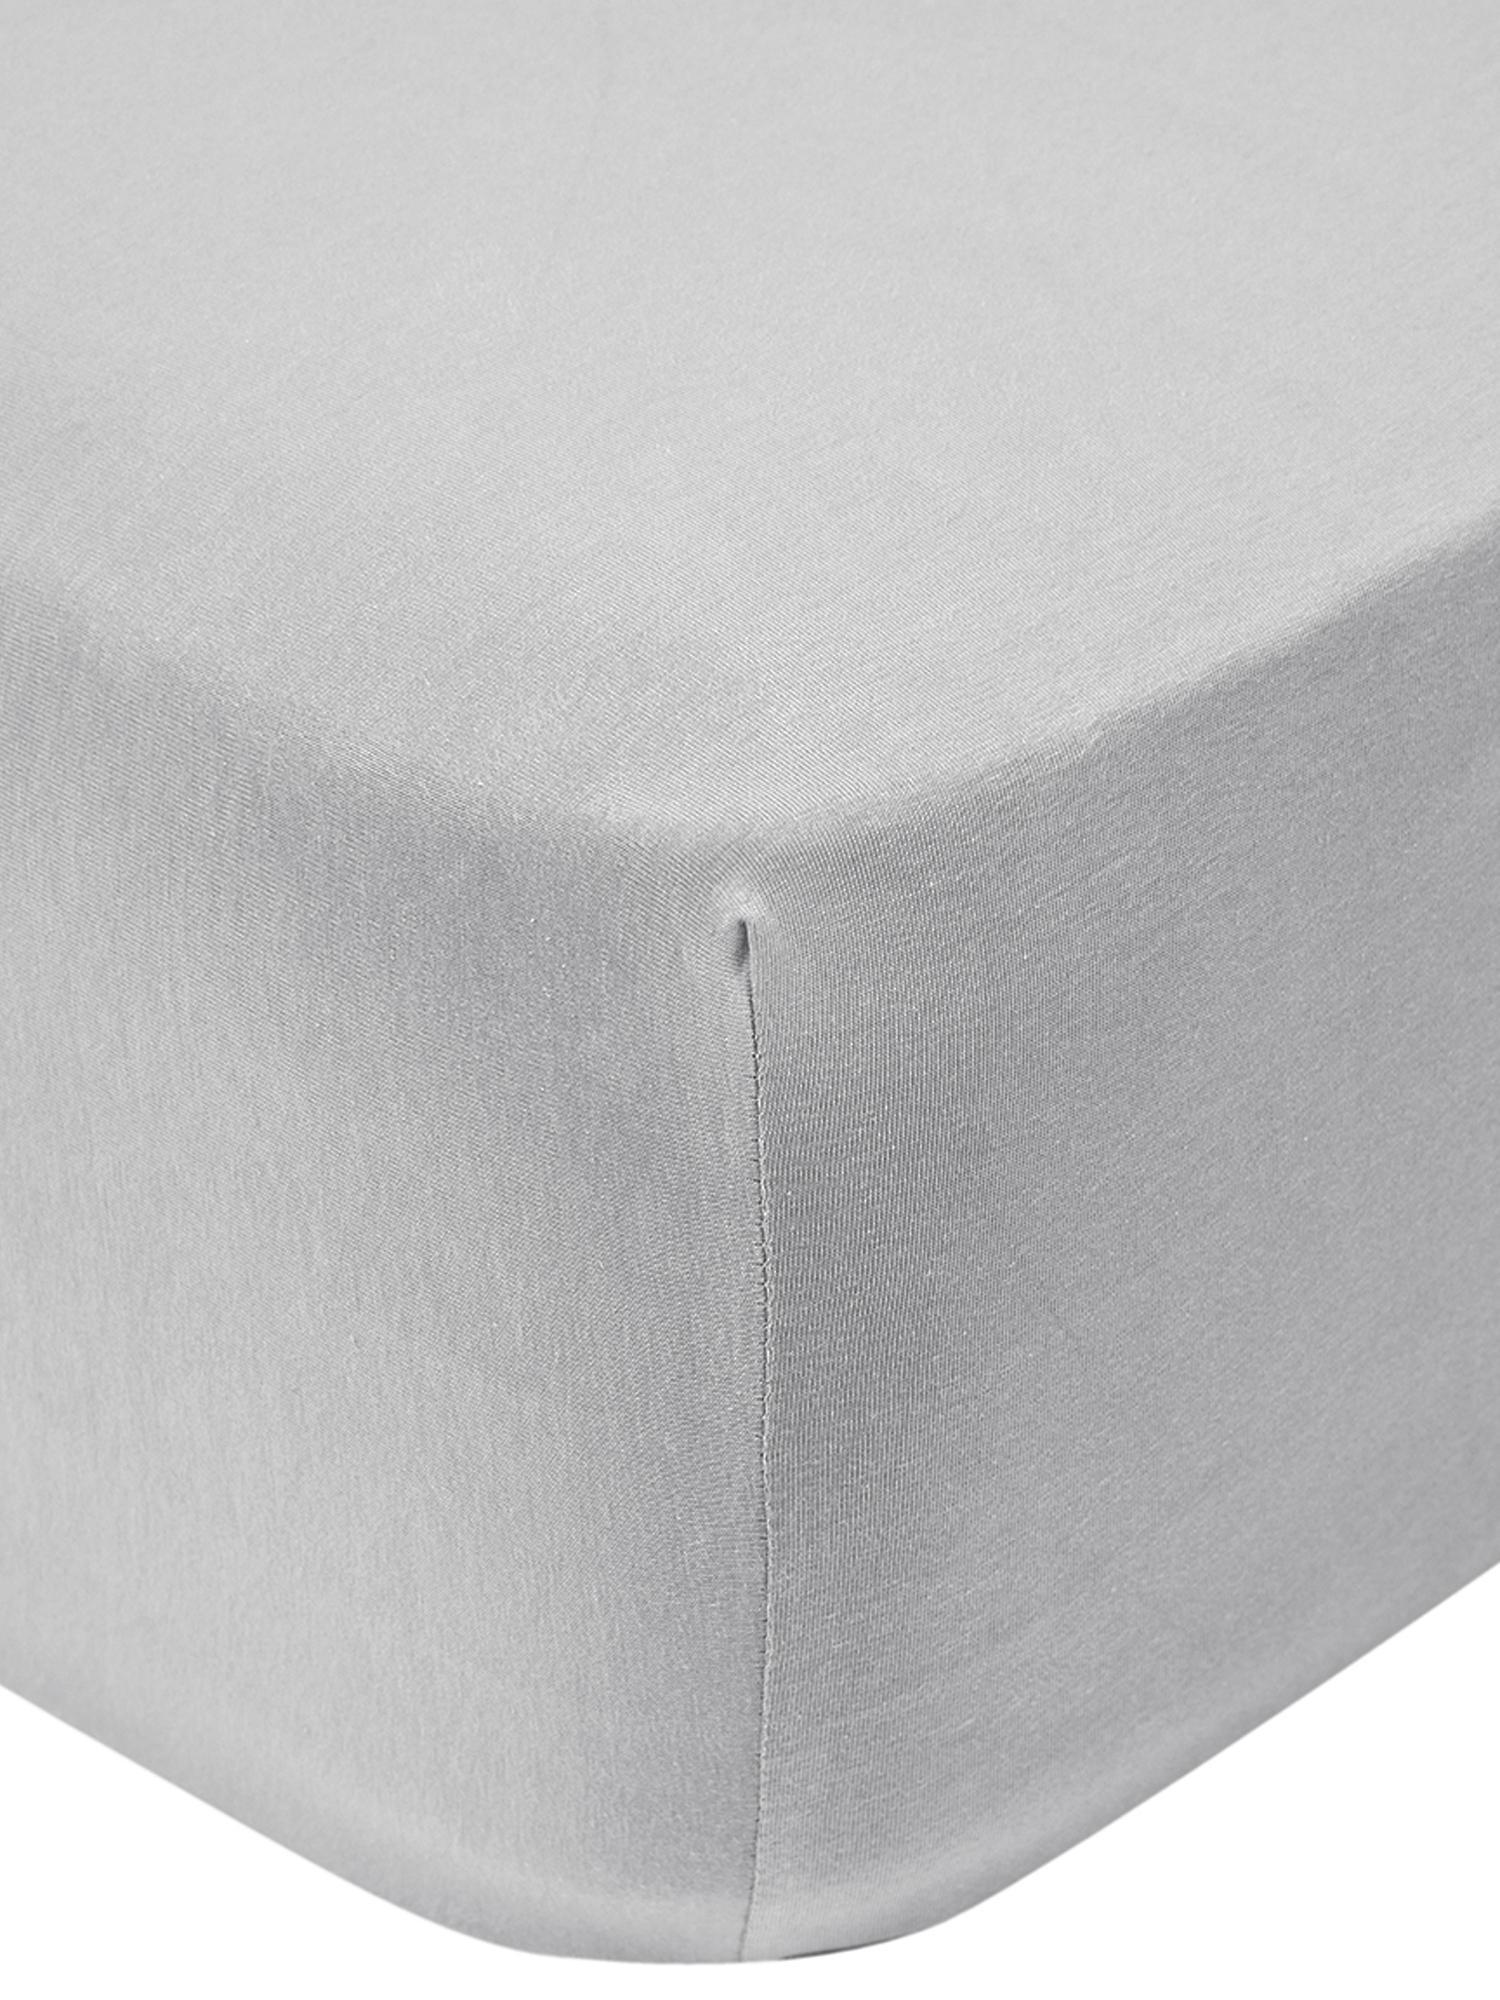 Boxspring-Spannbettlaken Lara, Jersey-Elasthan, 95% Baumwolle, 5% Elasthan, Hellgrau, 180 x 200 cm